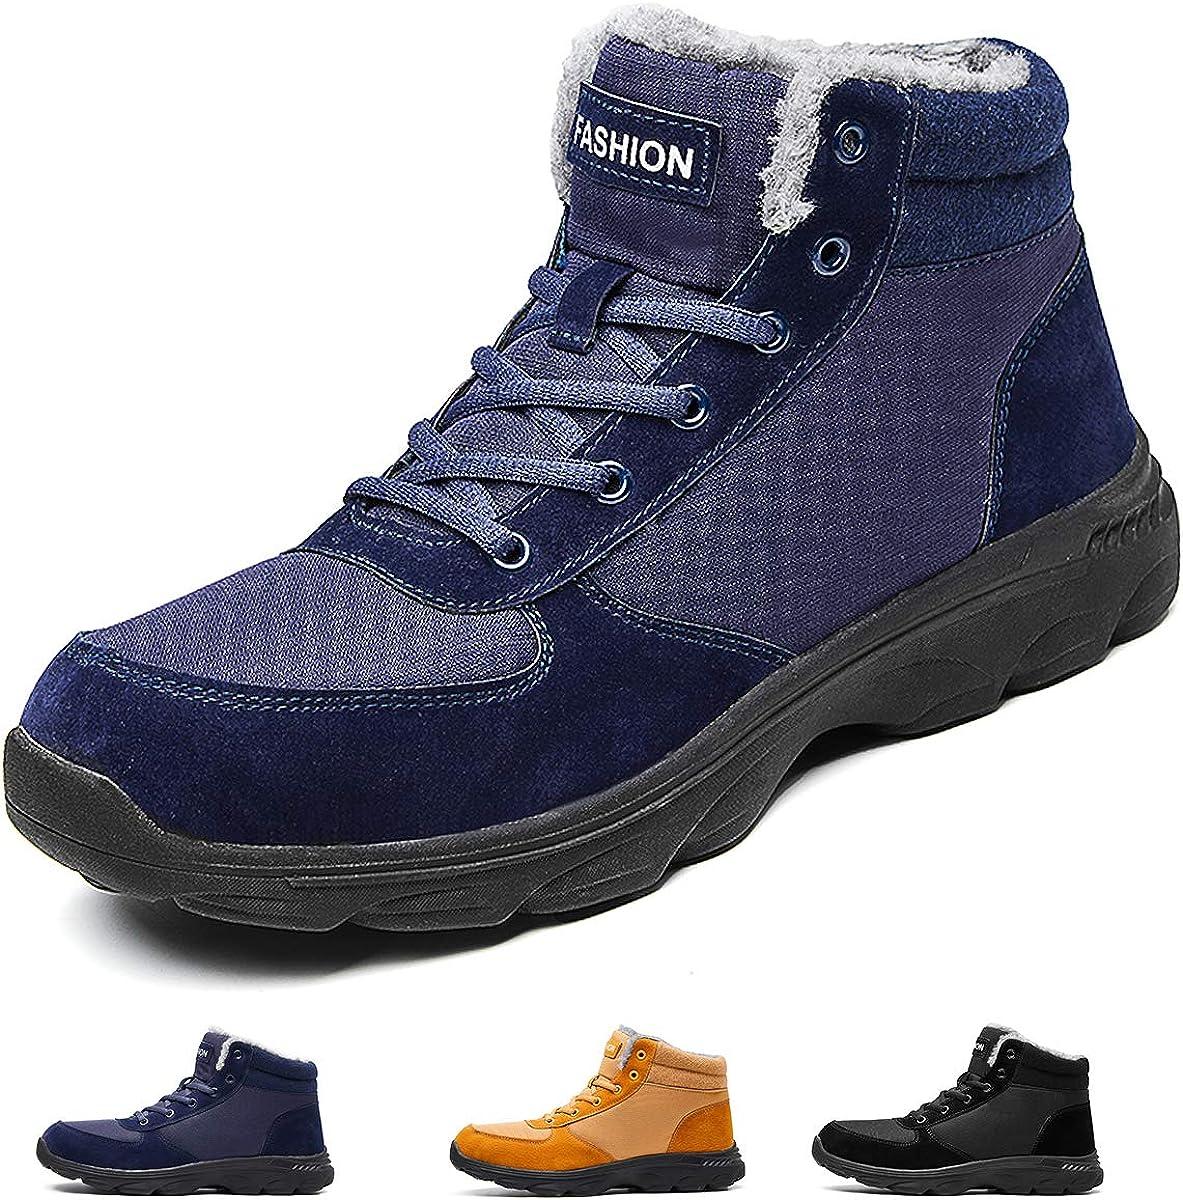 Sunny Holiday Mens Winter Boots Men